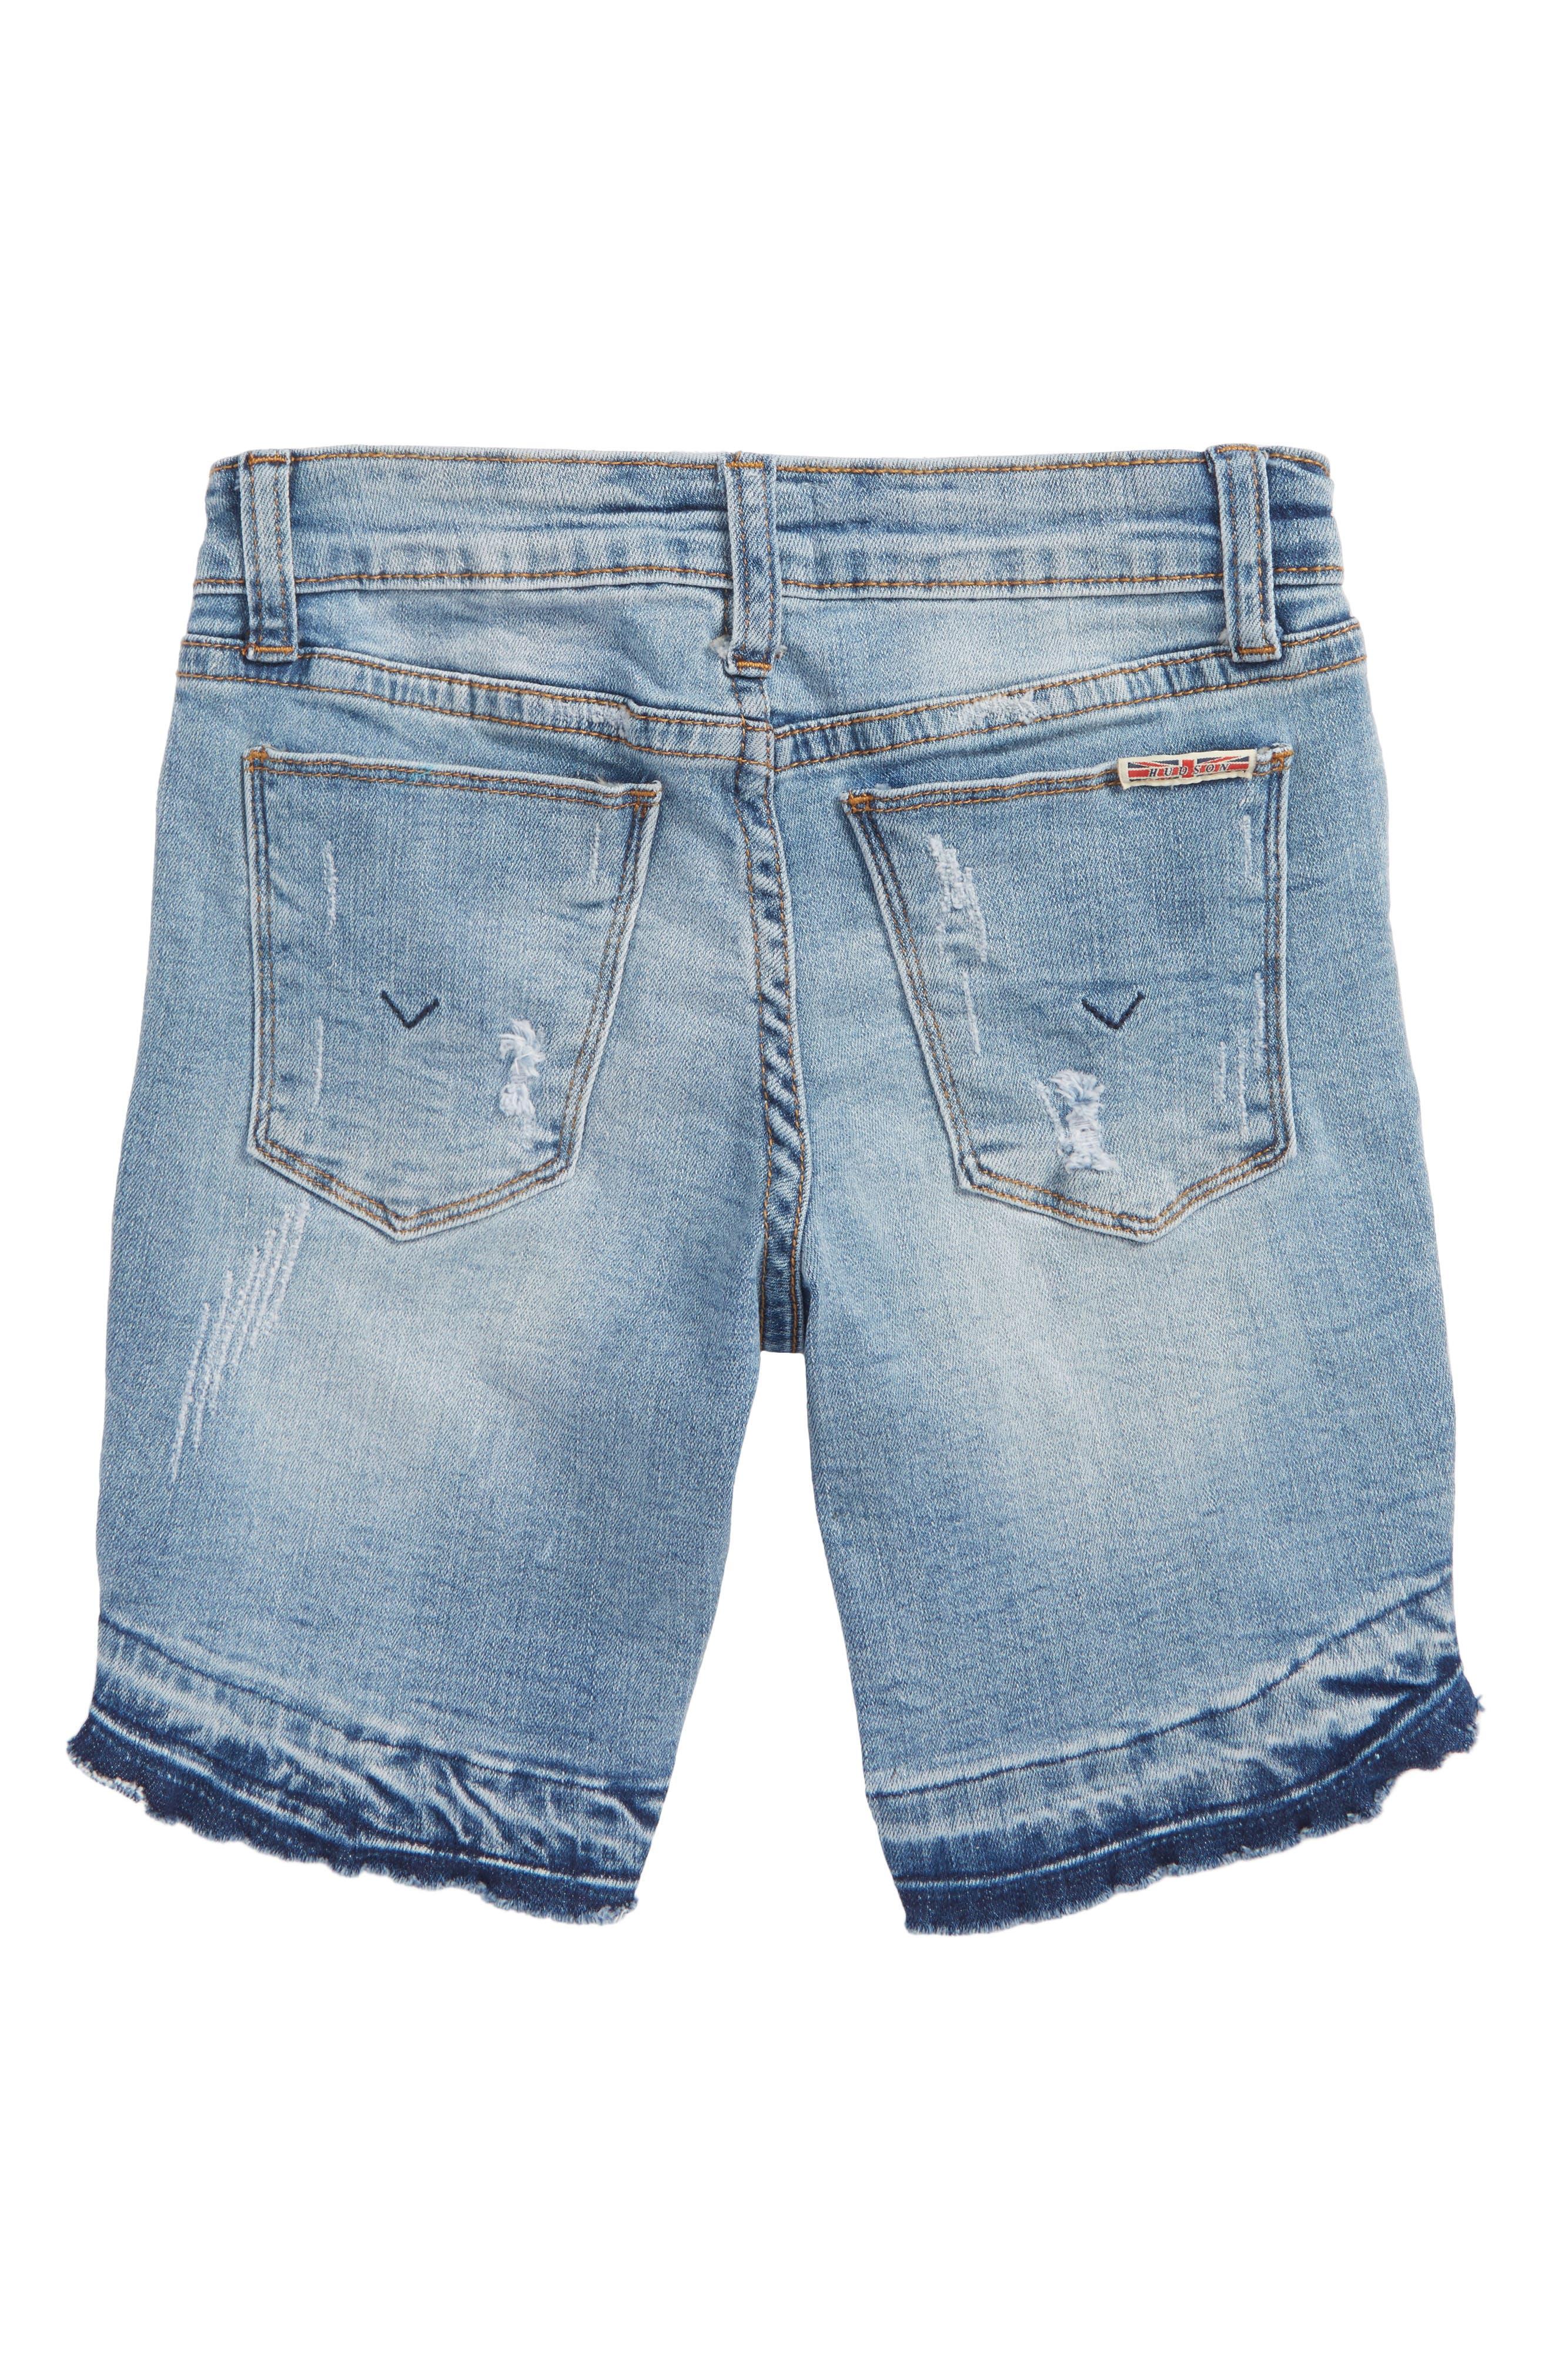 Release Hem Distressed Denim Shorts,                             Alternate thumbnail 2, color,                             Cali Blue